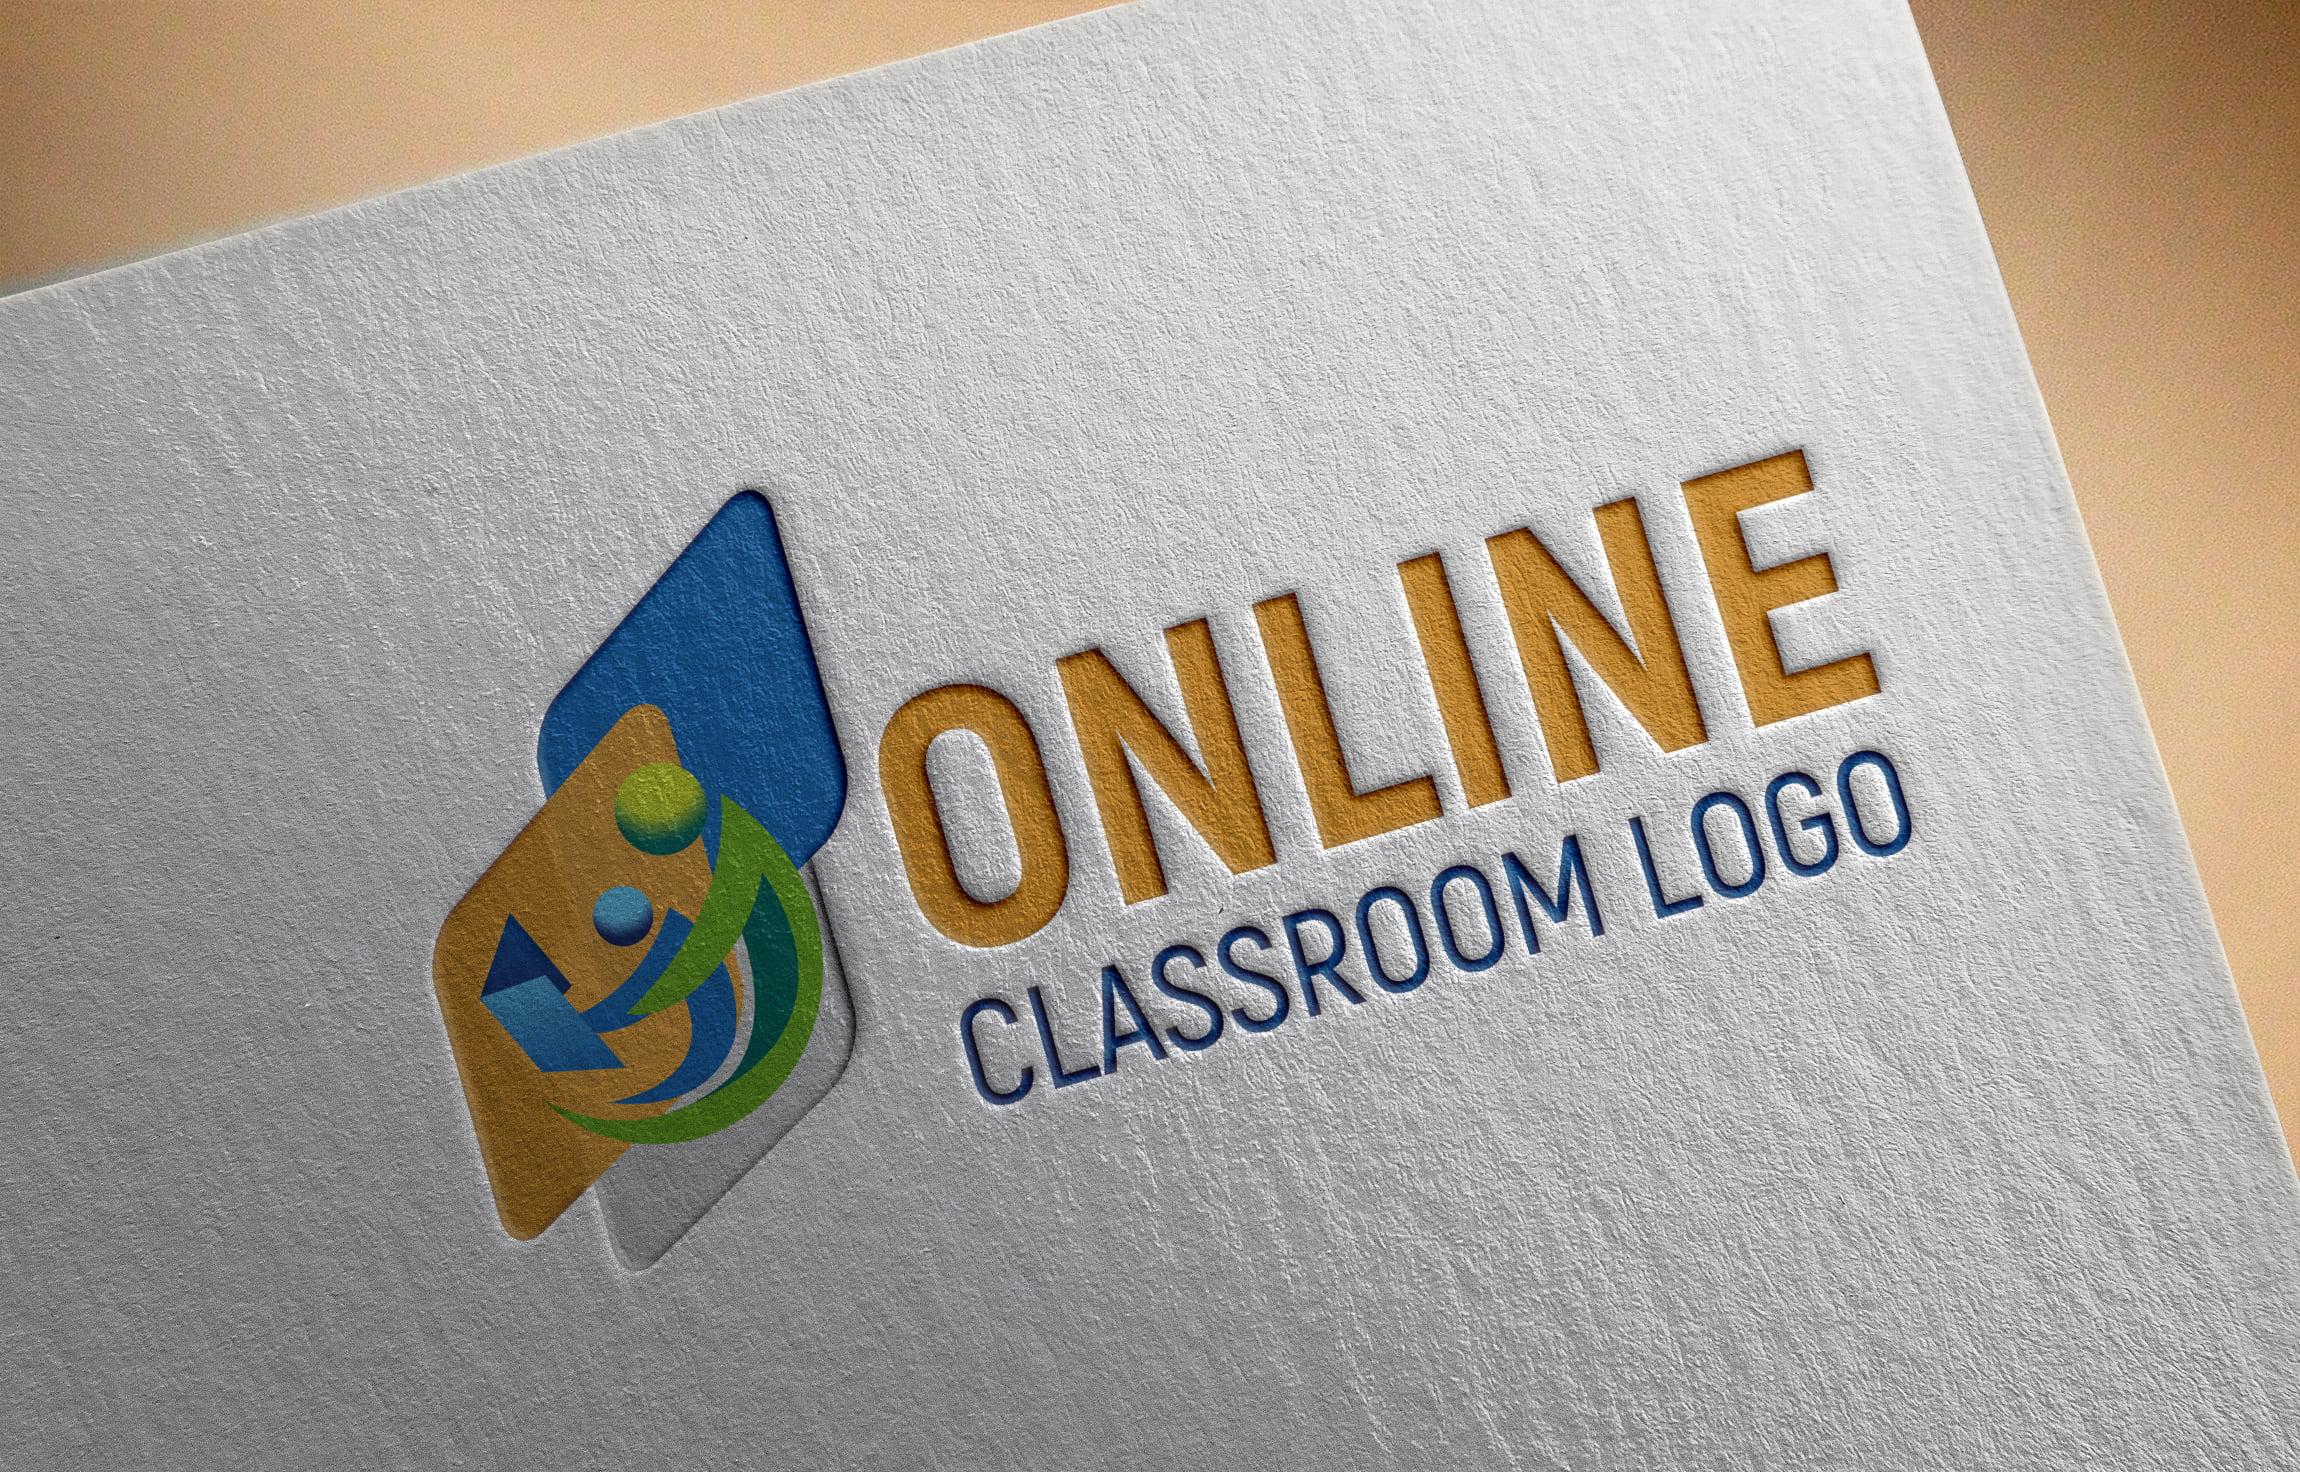 Online Class logo on White paper